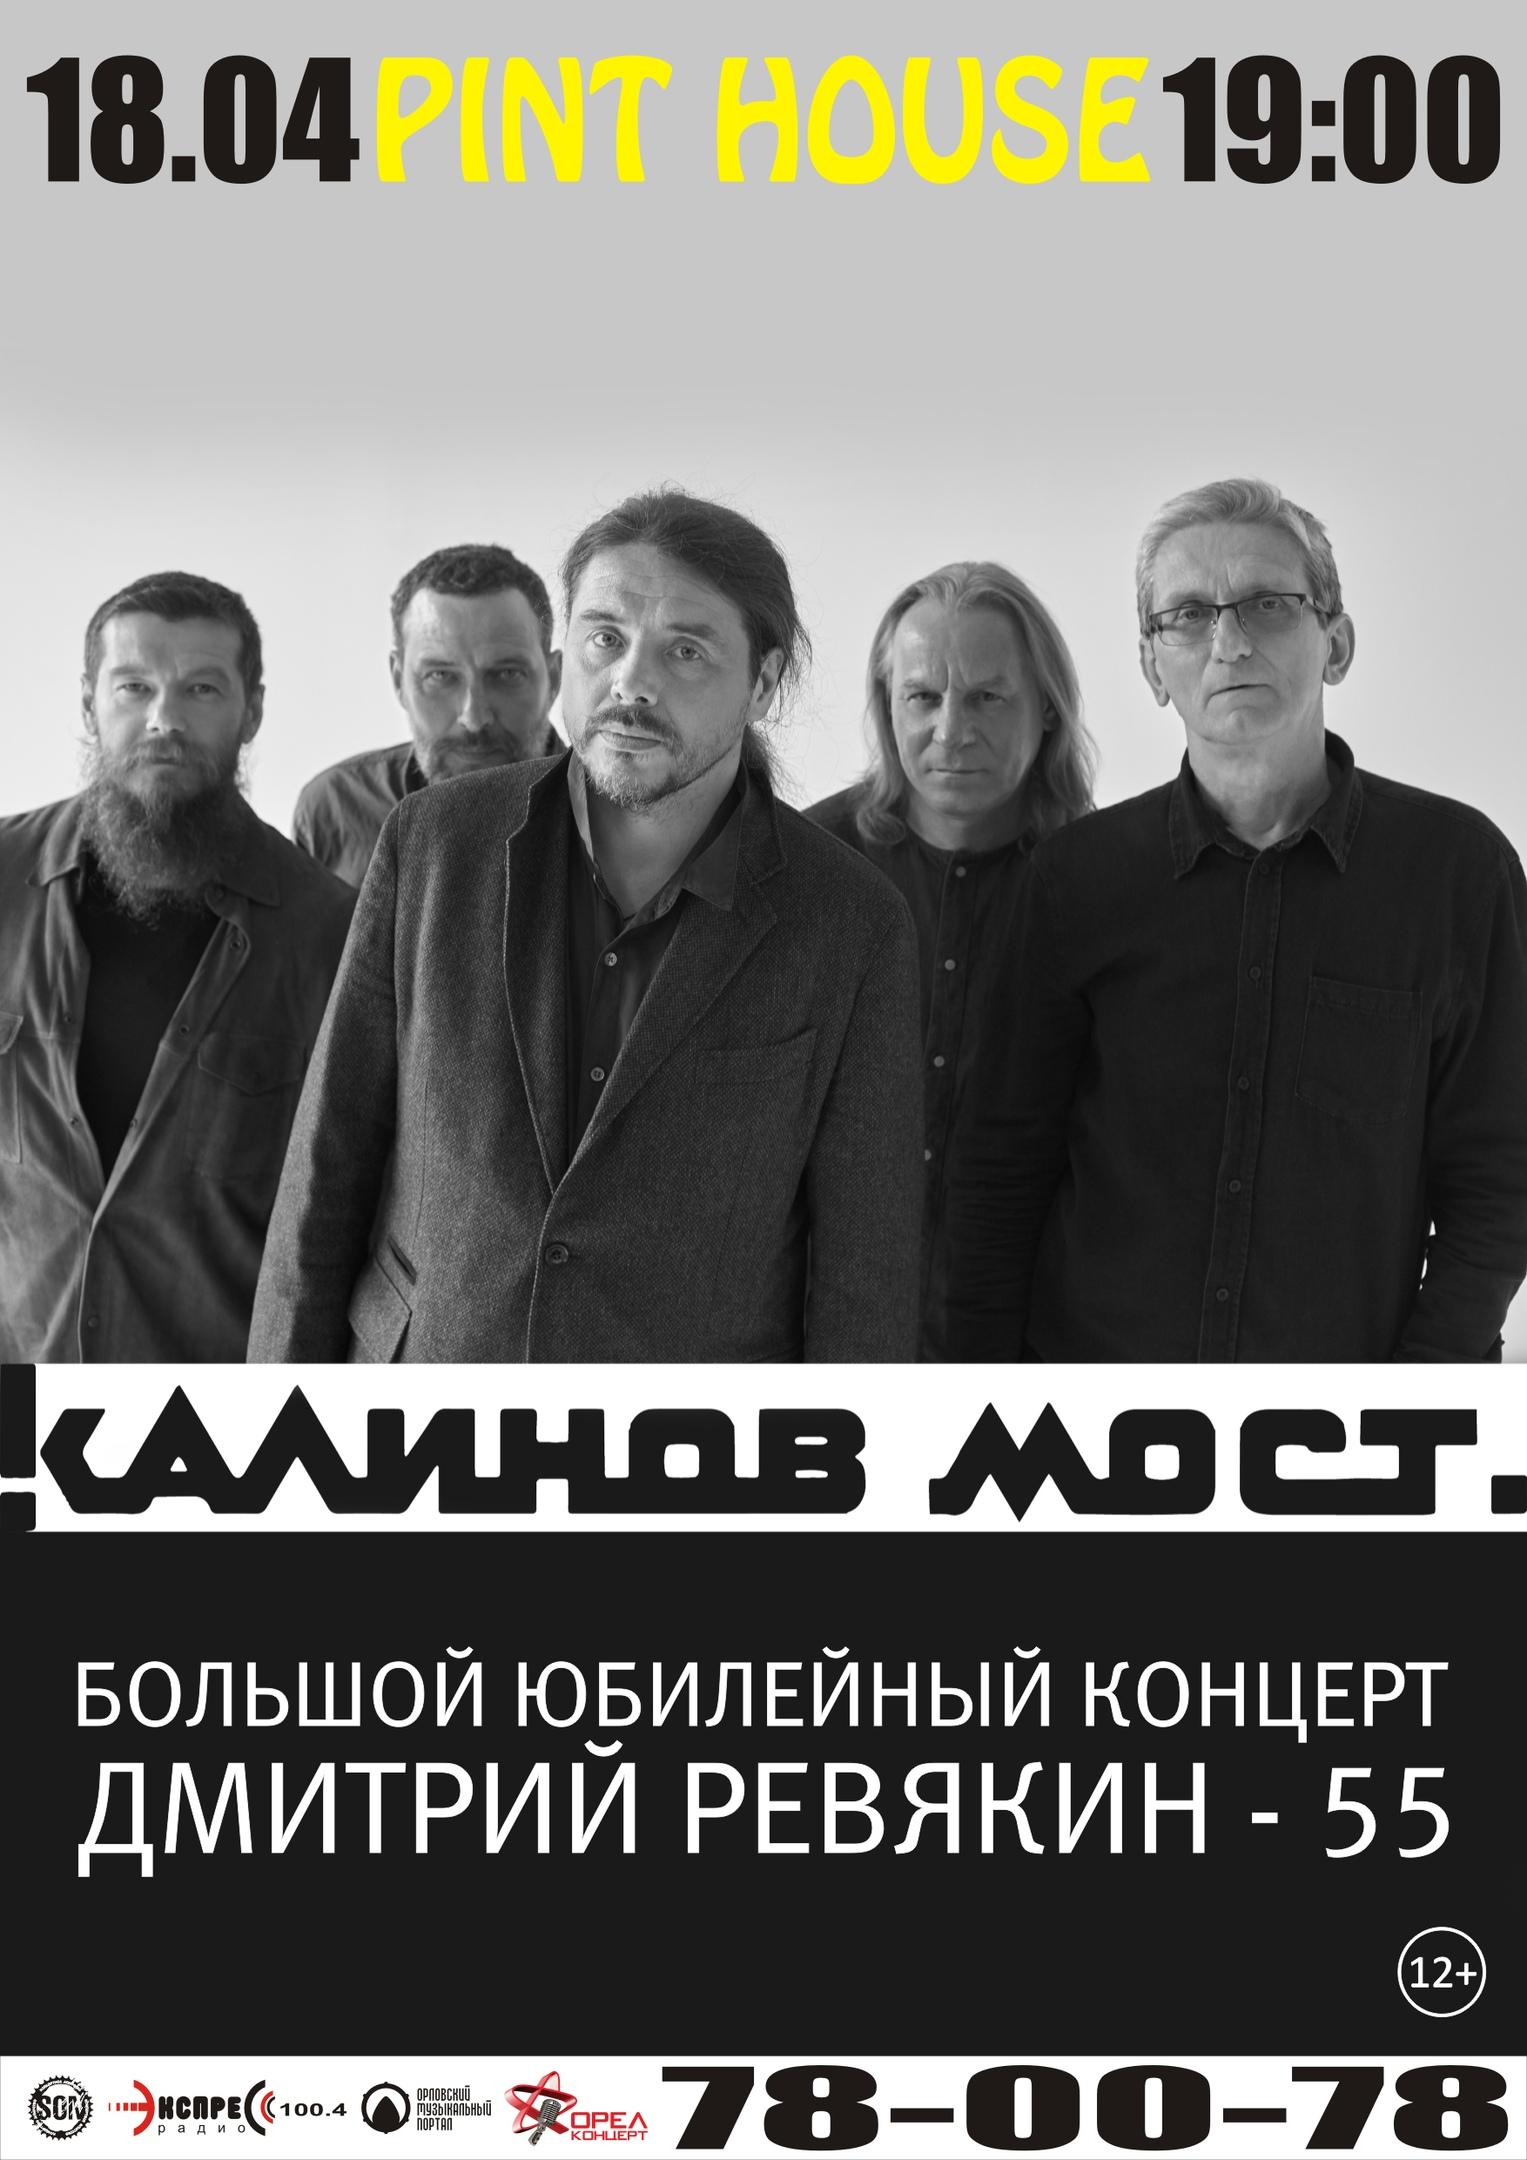 Калинов Мост «Дмитрий Ревякин - 55»